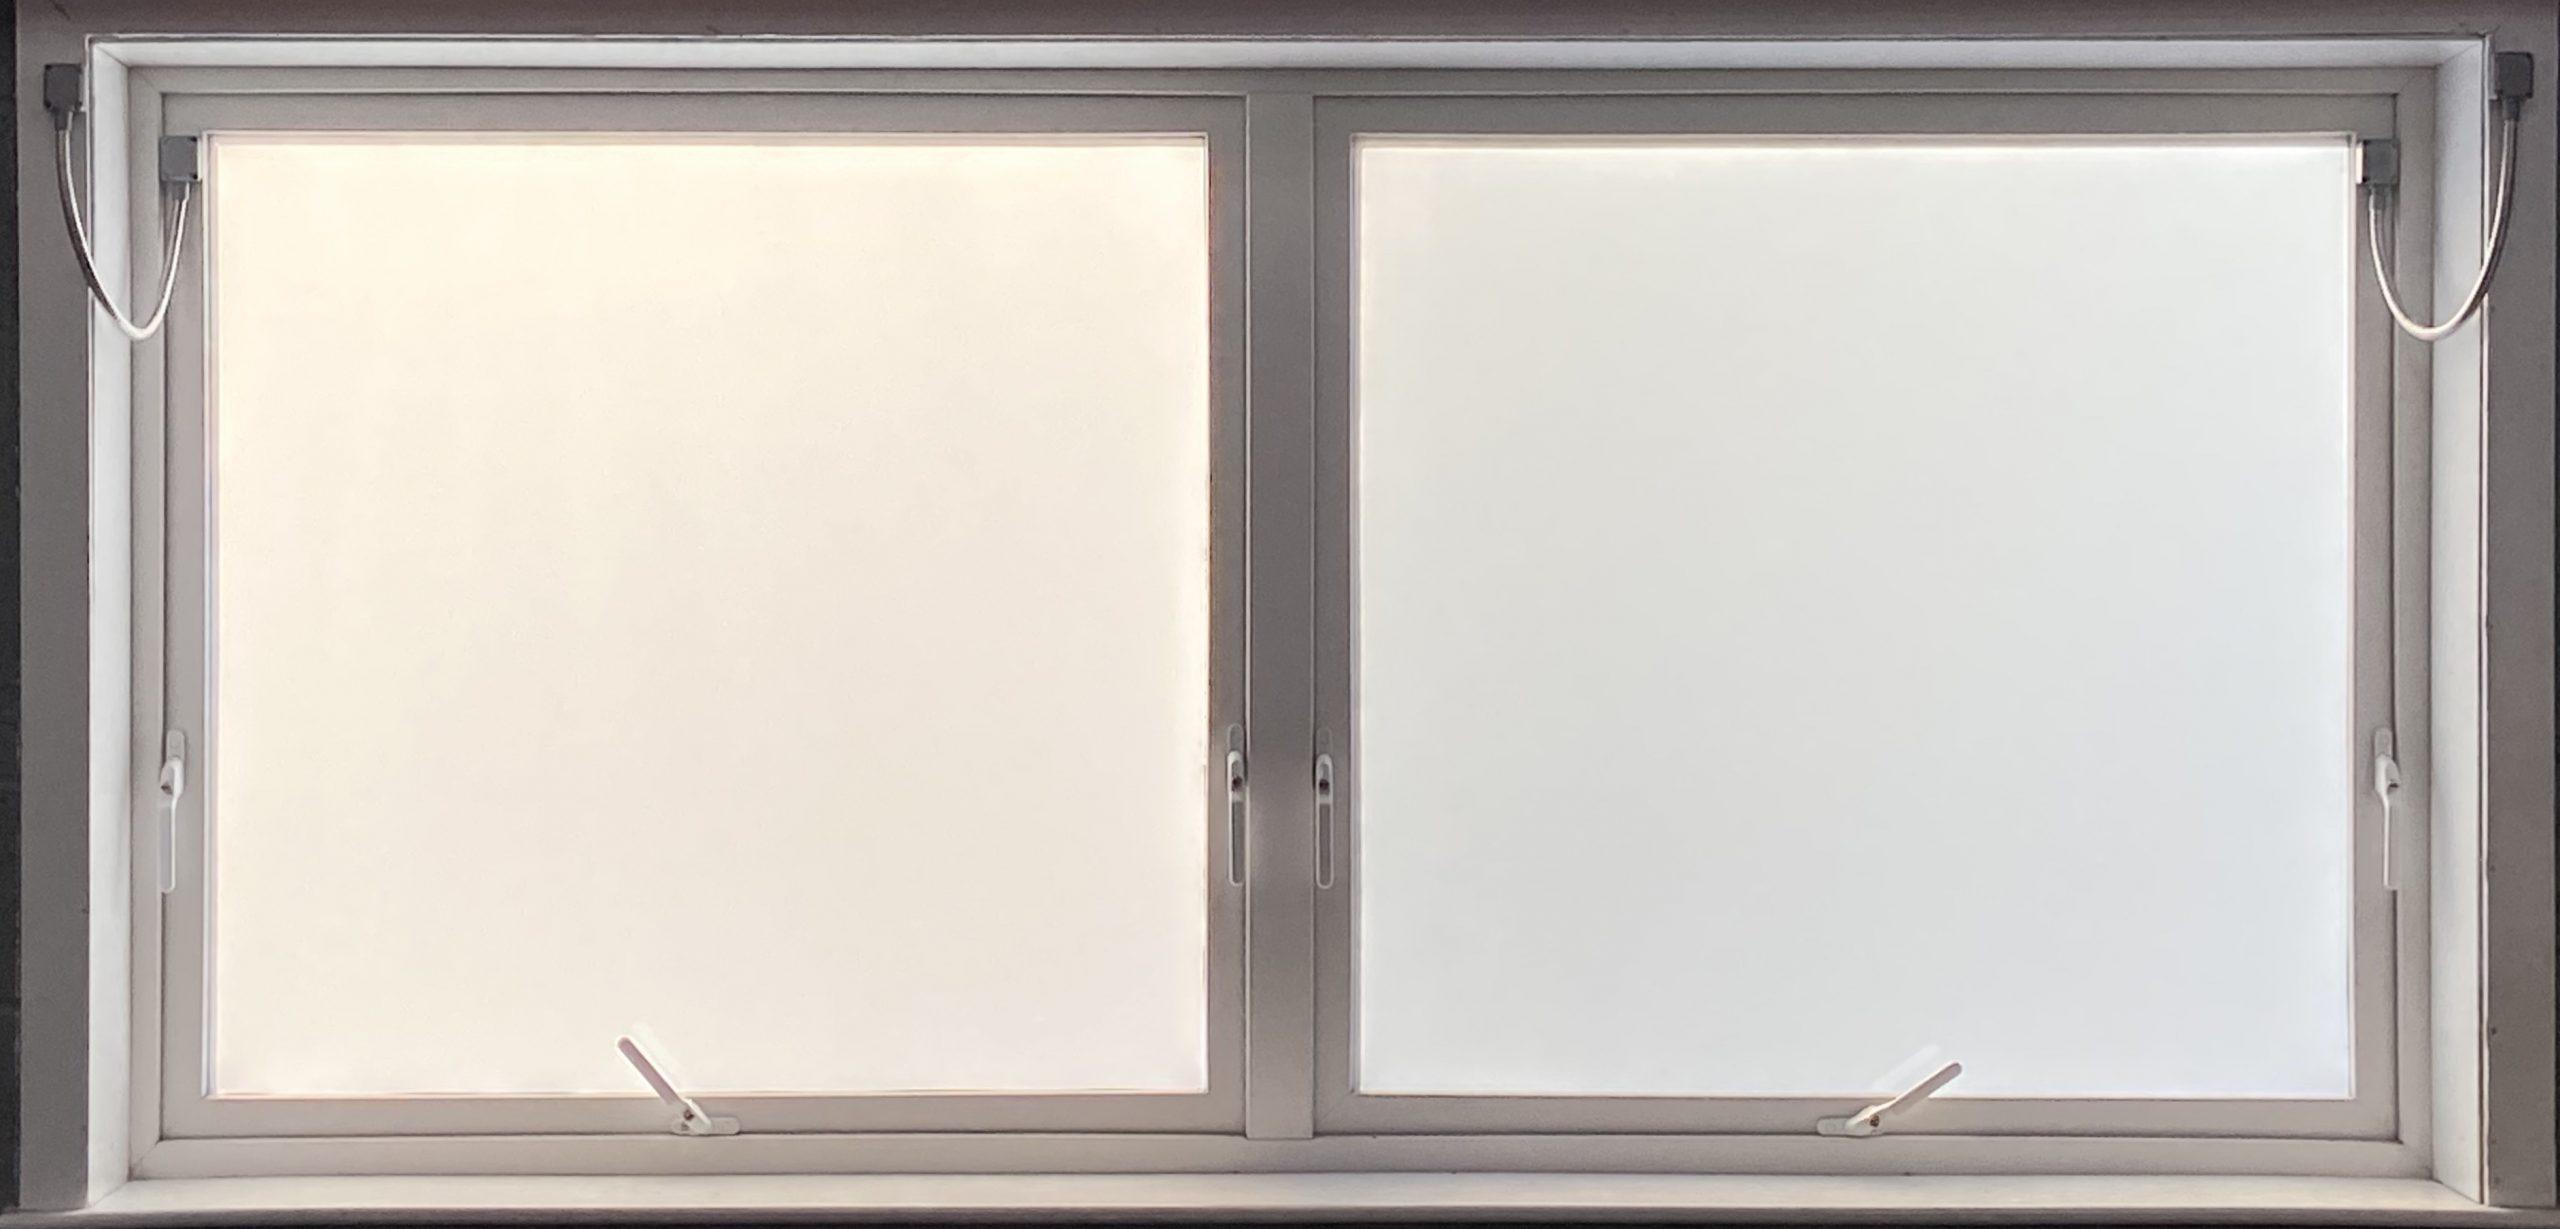 Tecdur Privacy Glass Installation